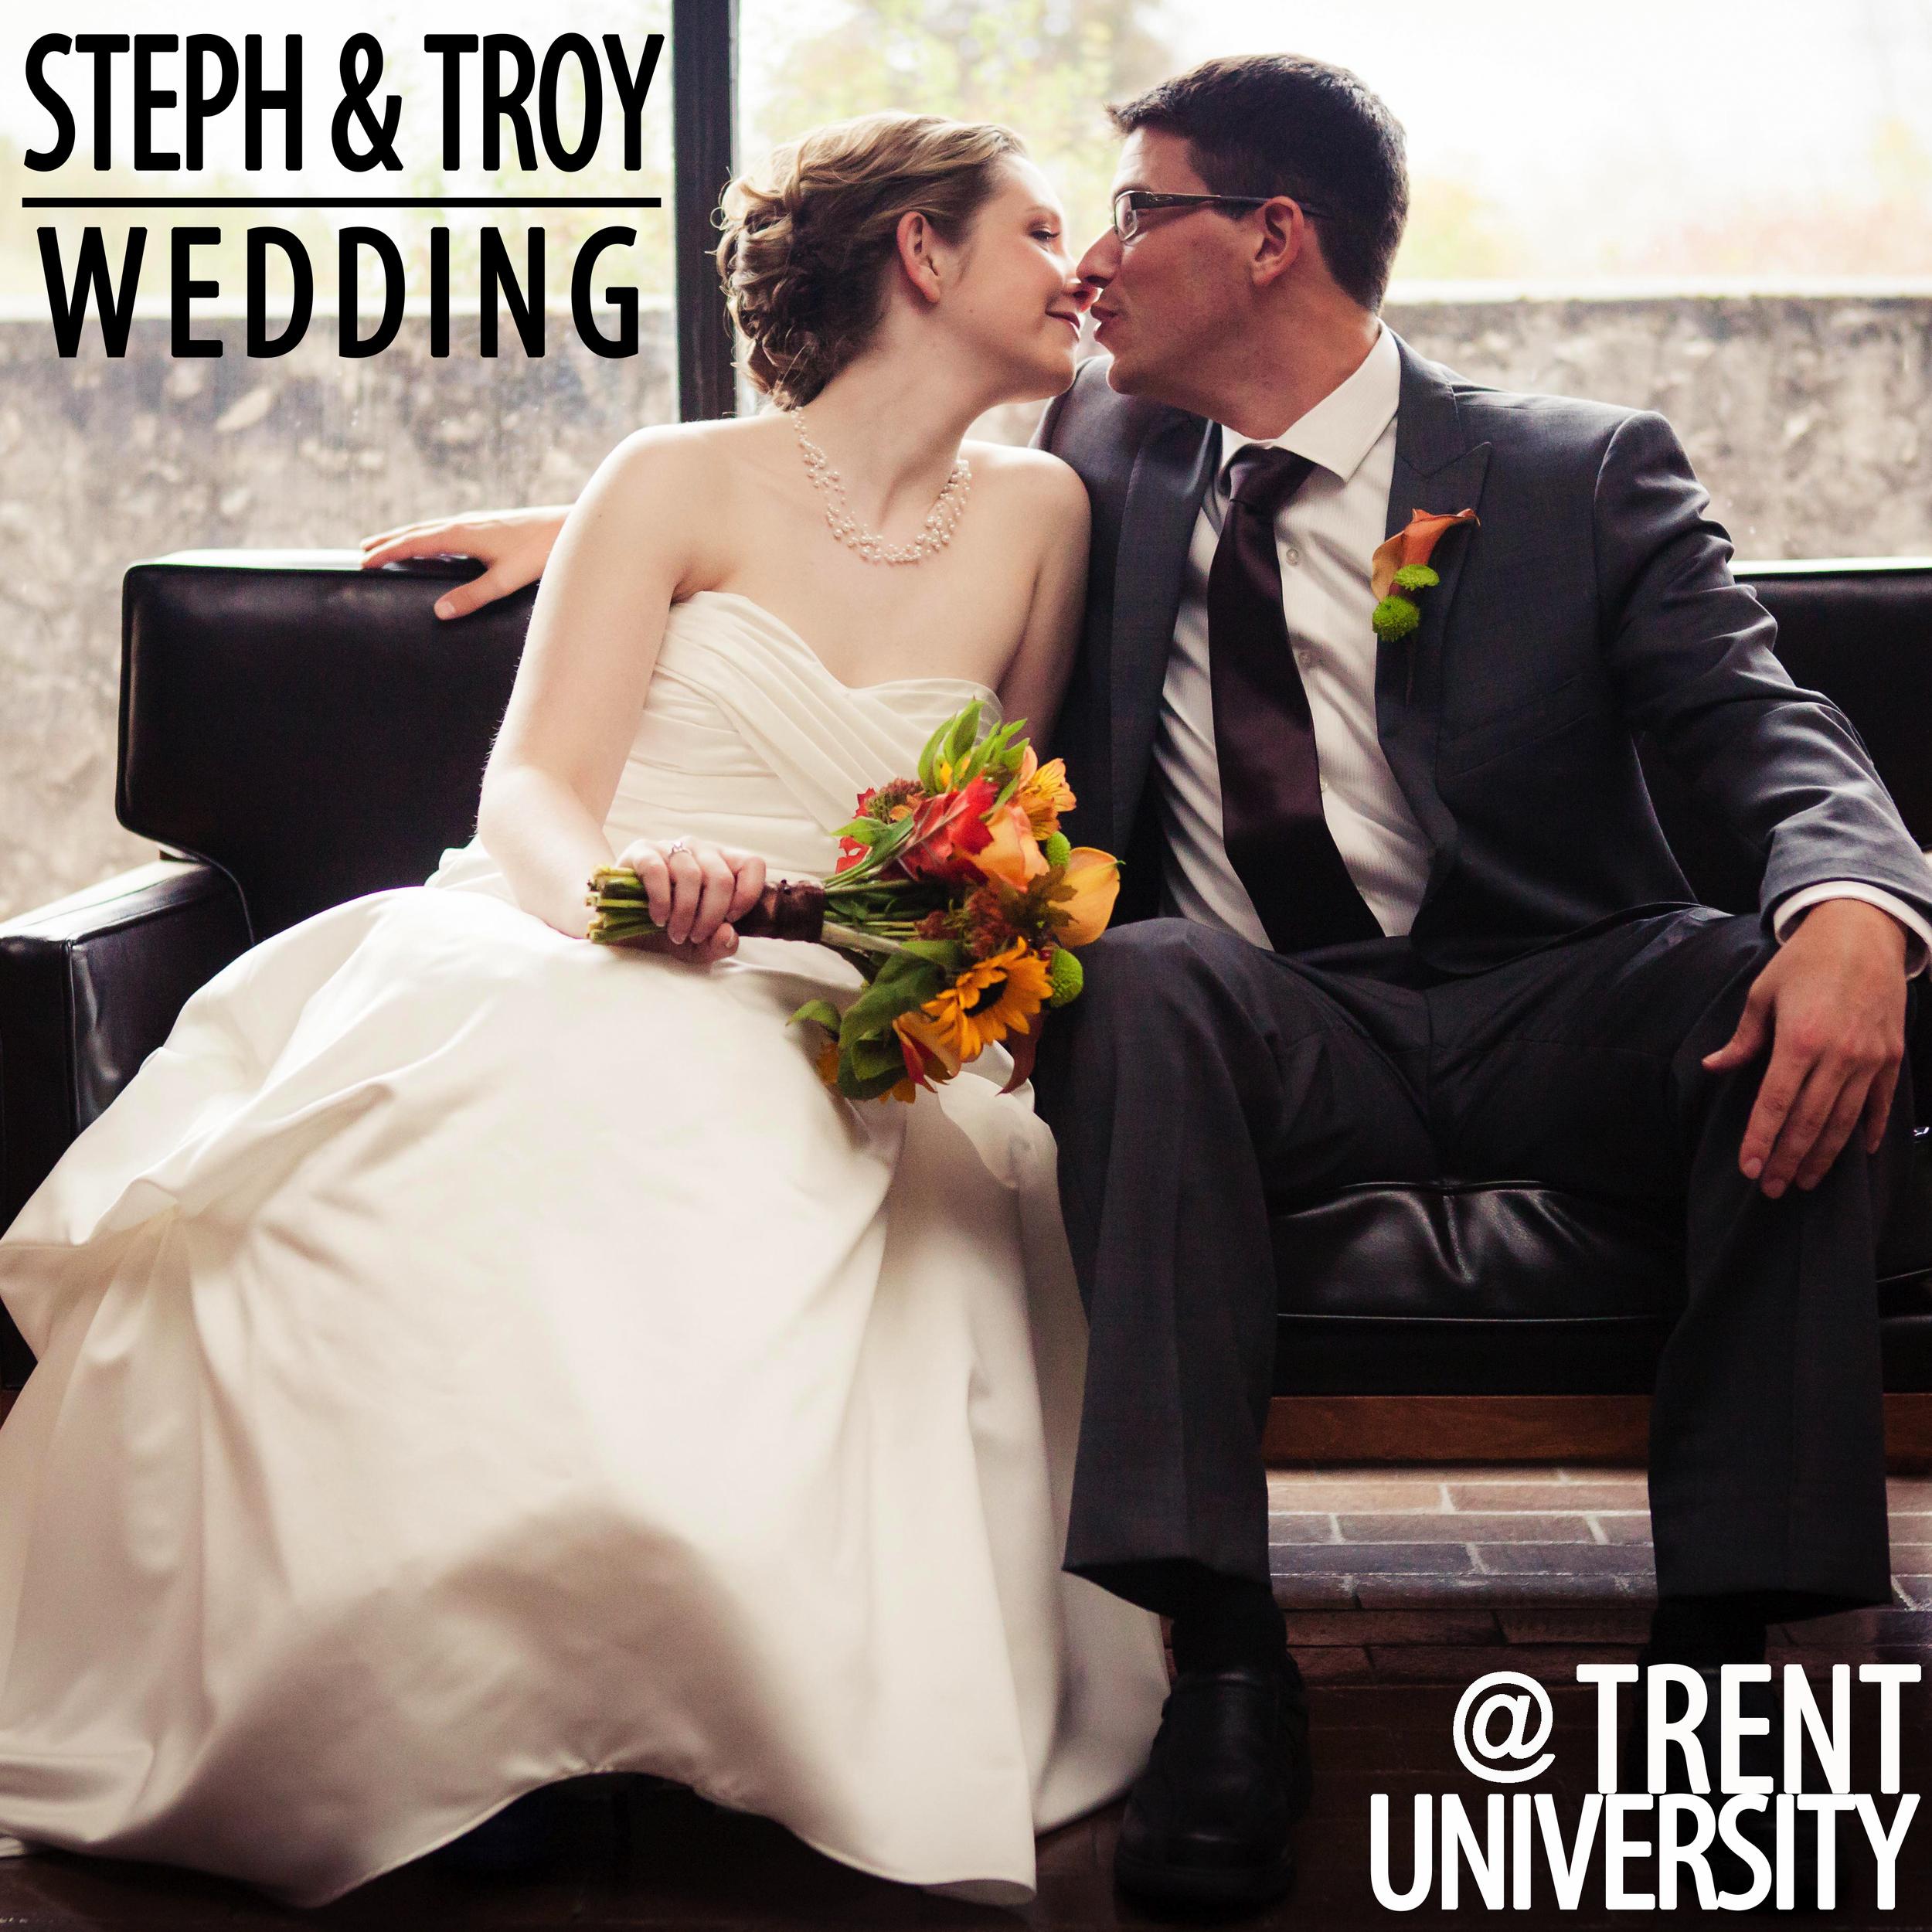 Toronto_wedding_photography_steph_troy_title.jpg